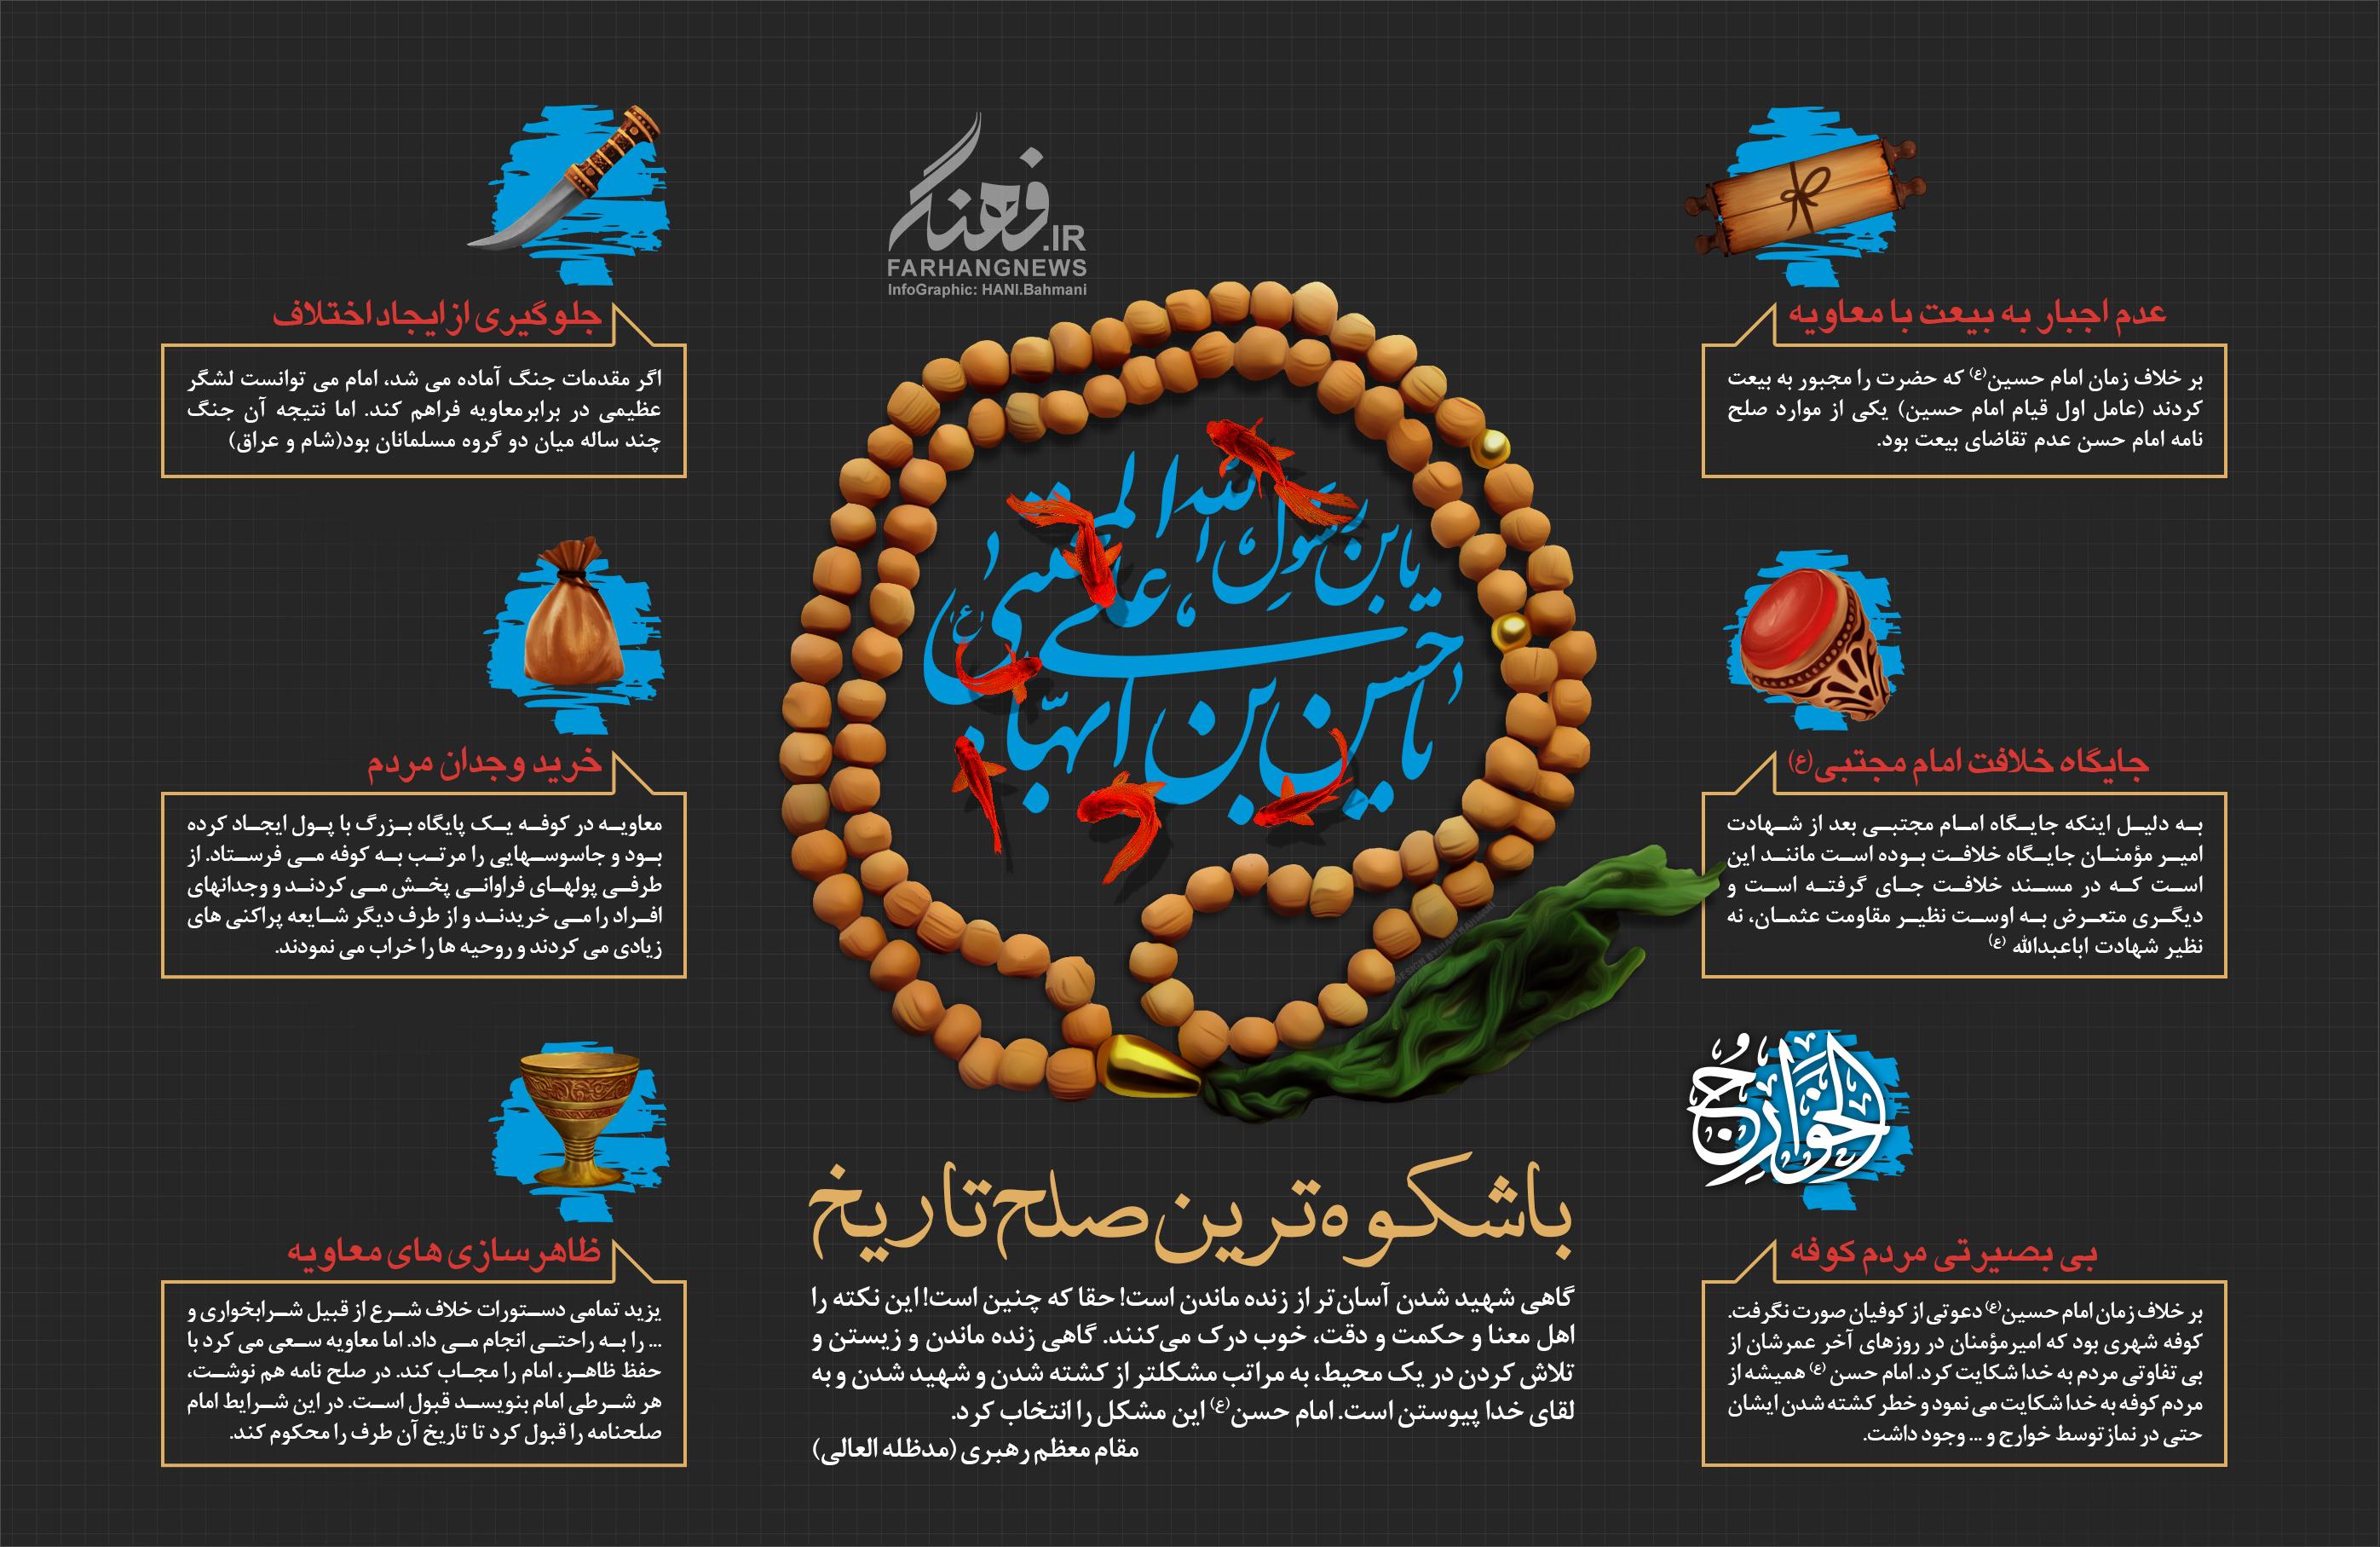 اینفوگرافیک - امام حسن (علیه السلام)